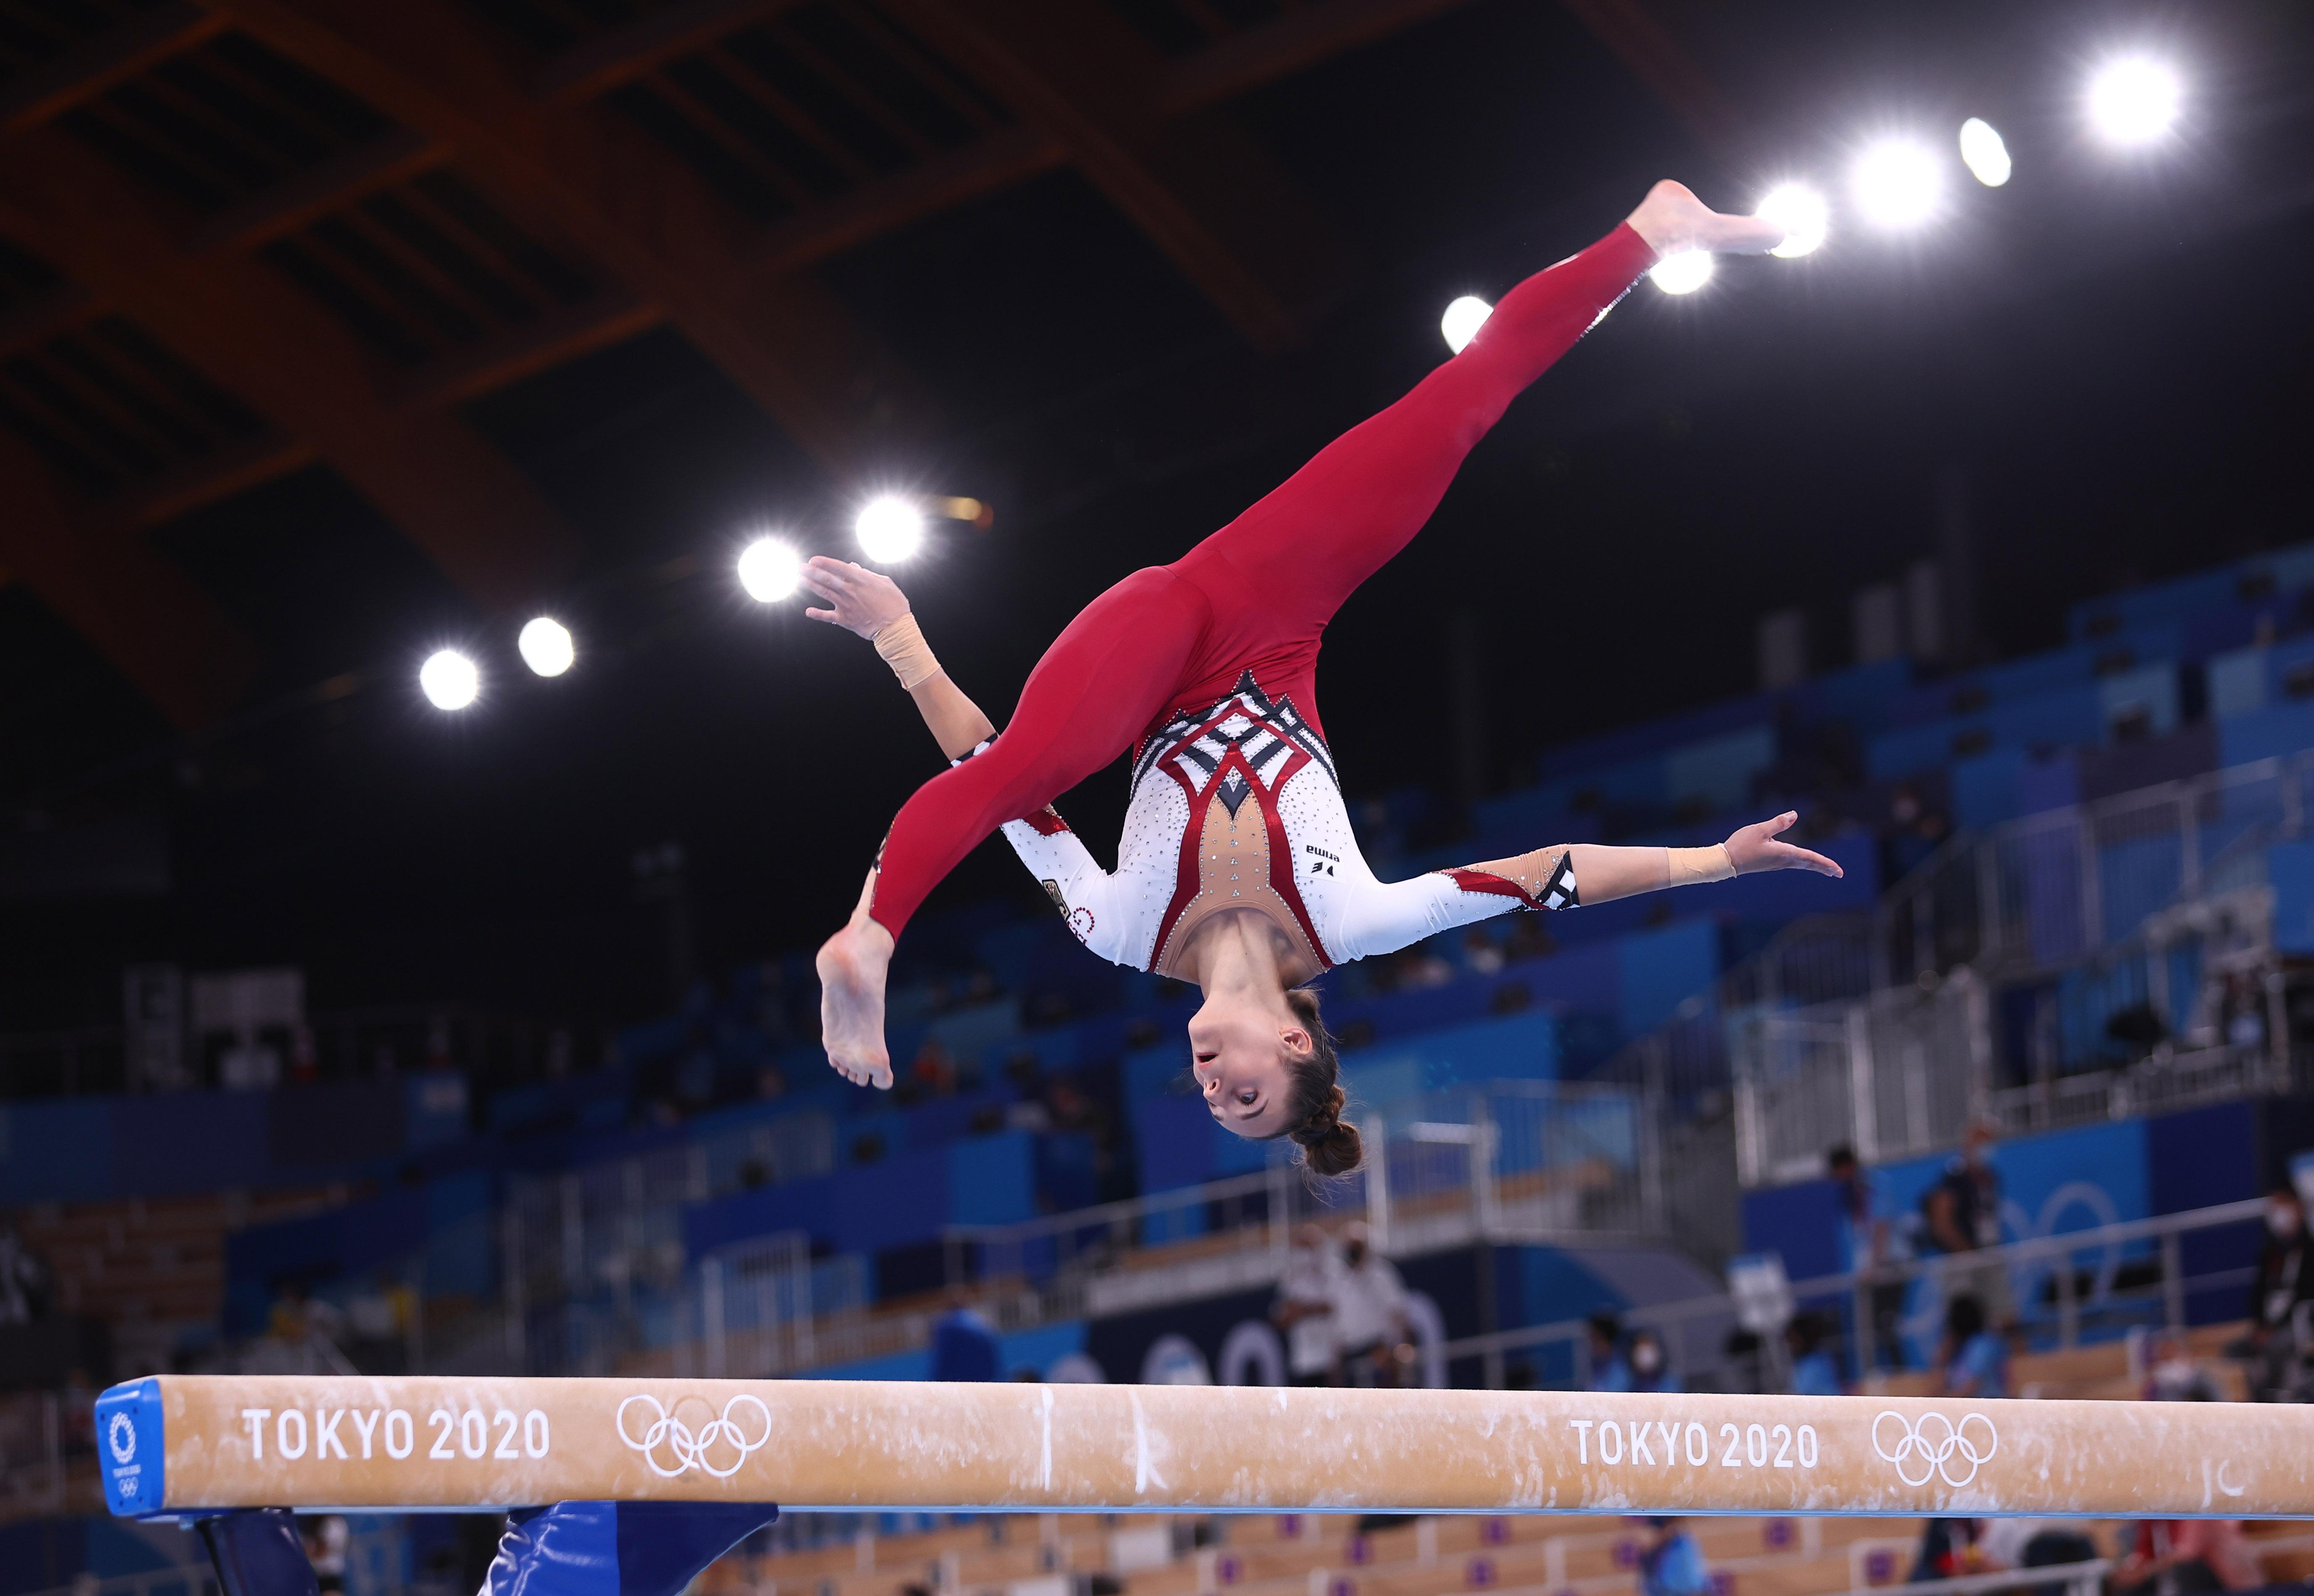 Tokyo 2020 Olympics - Gymnastics - Artistic - Women's Beam - Qualification - Ariake Gymnastics Centre, Tokyo, Japan - July 25, 2021. Pauline Schaefer of Germany in action on the balance beam REUTERS/Mike Blake